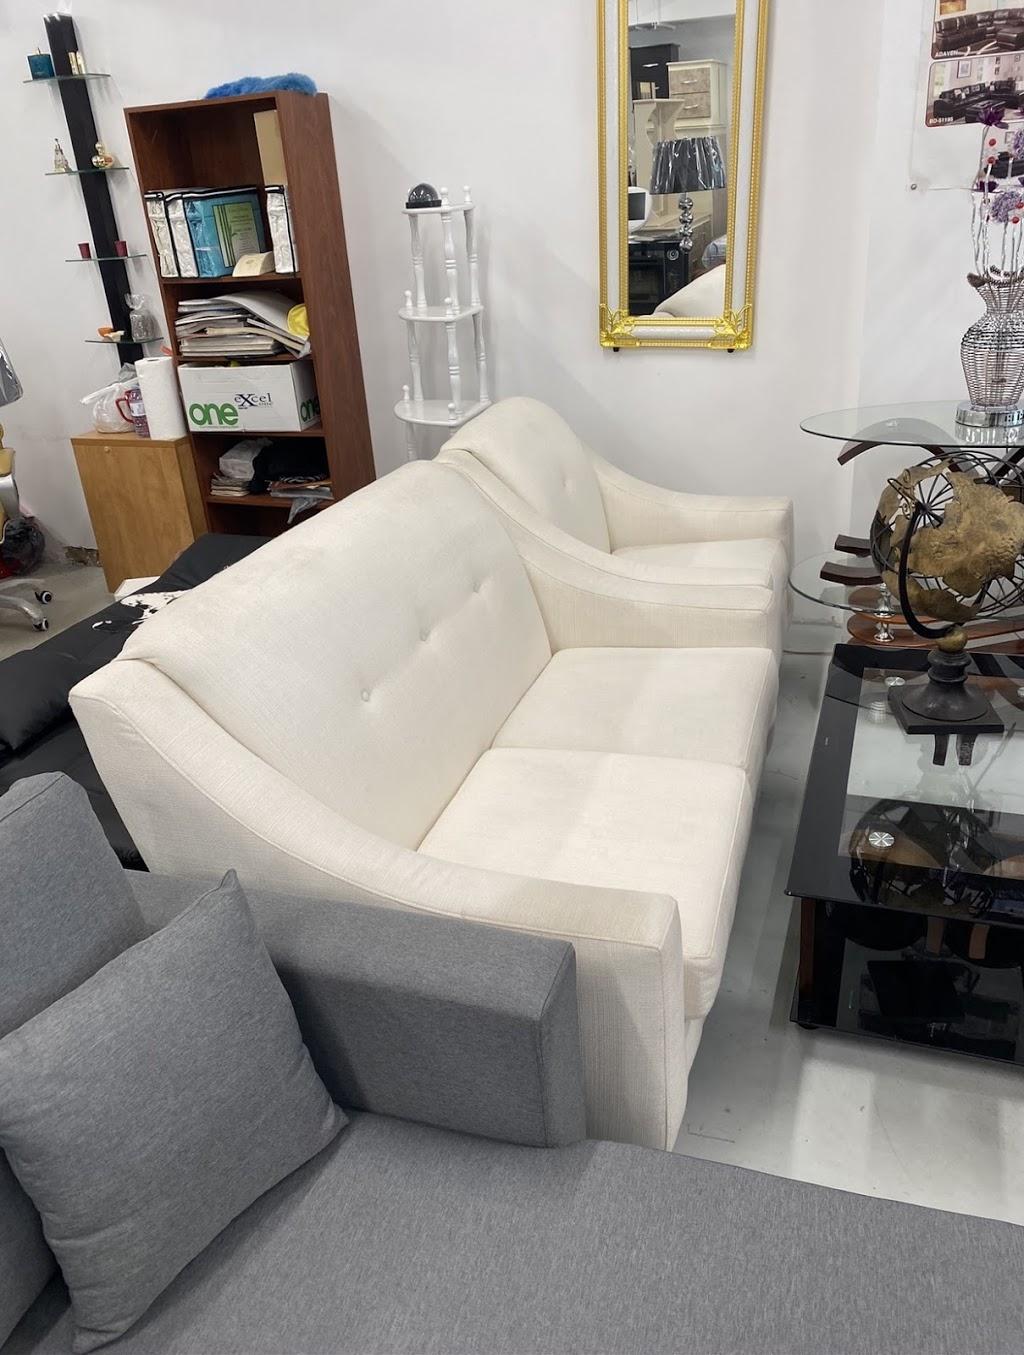 A&A Furniture & Decor   furniture store   1766 Weston Rd, York, ON M9N 1V8, Canada   4169012428 OR +1 416-901-2428